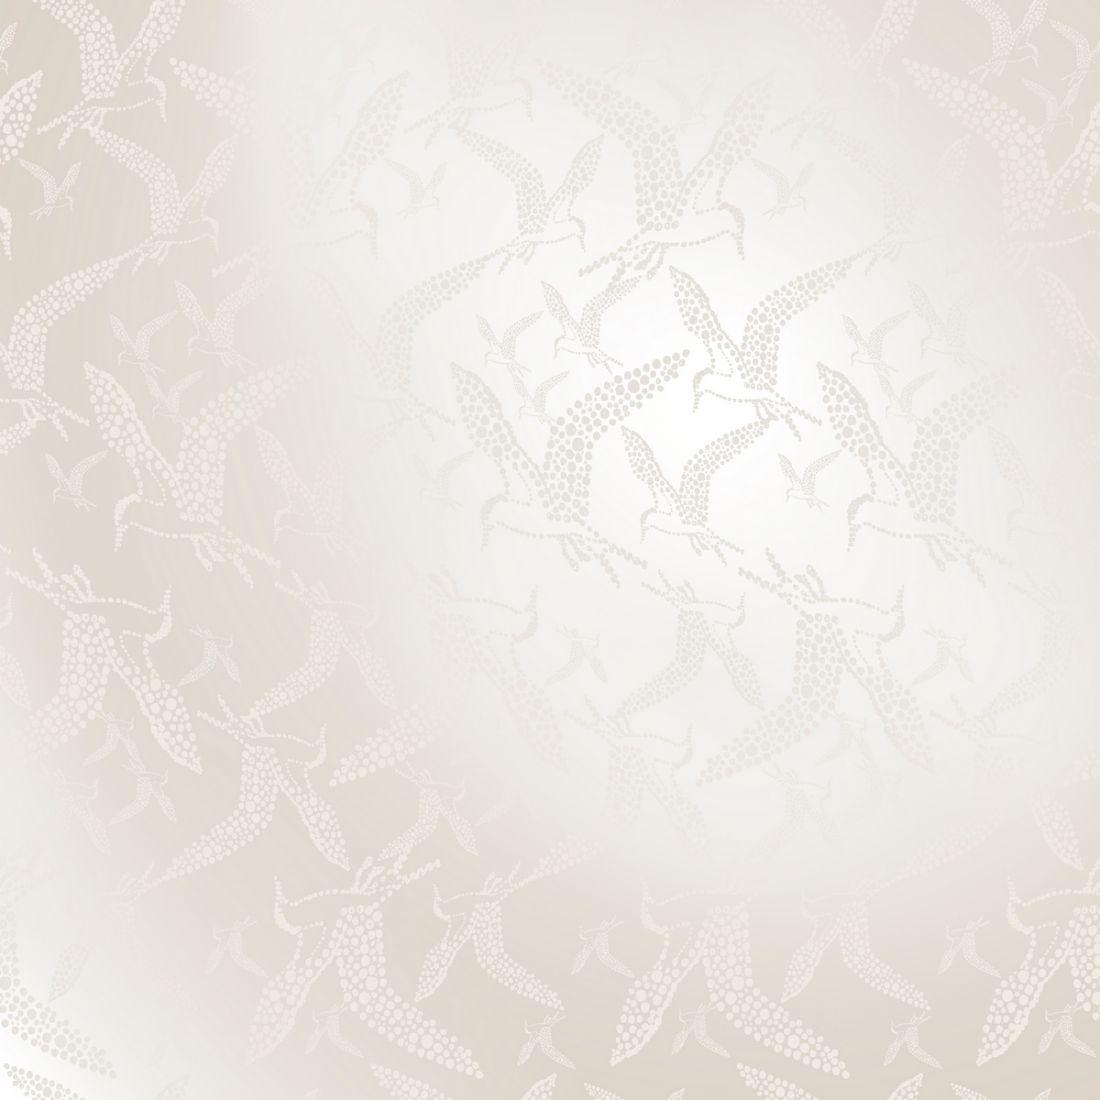 IvanaHelsinki イヴァナヘルシンキフィンランド製 壁紙5246-2【 53cm幅×10m巻 】裏面:フリース素材鳥 北欧 自然 アイボリー ライトベージュ 光沢感輸入壁紙IvanaHelsinki Wallpaper★P10倍★